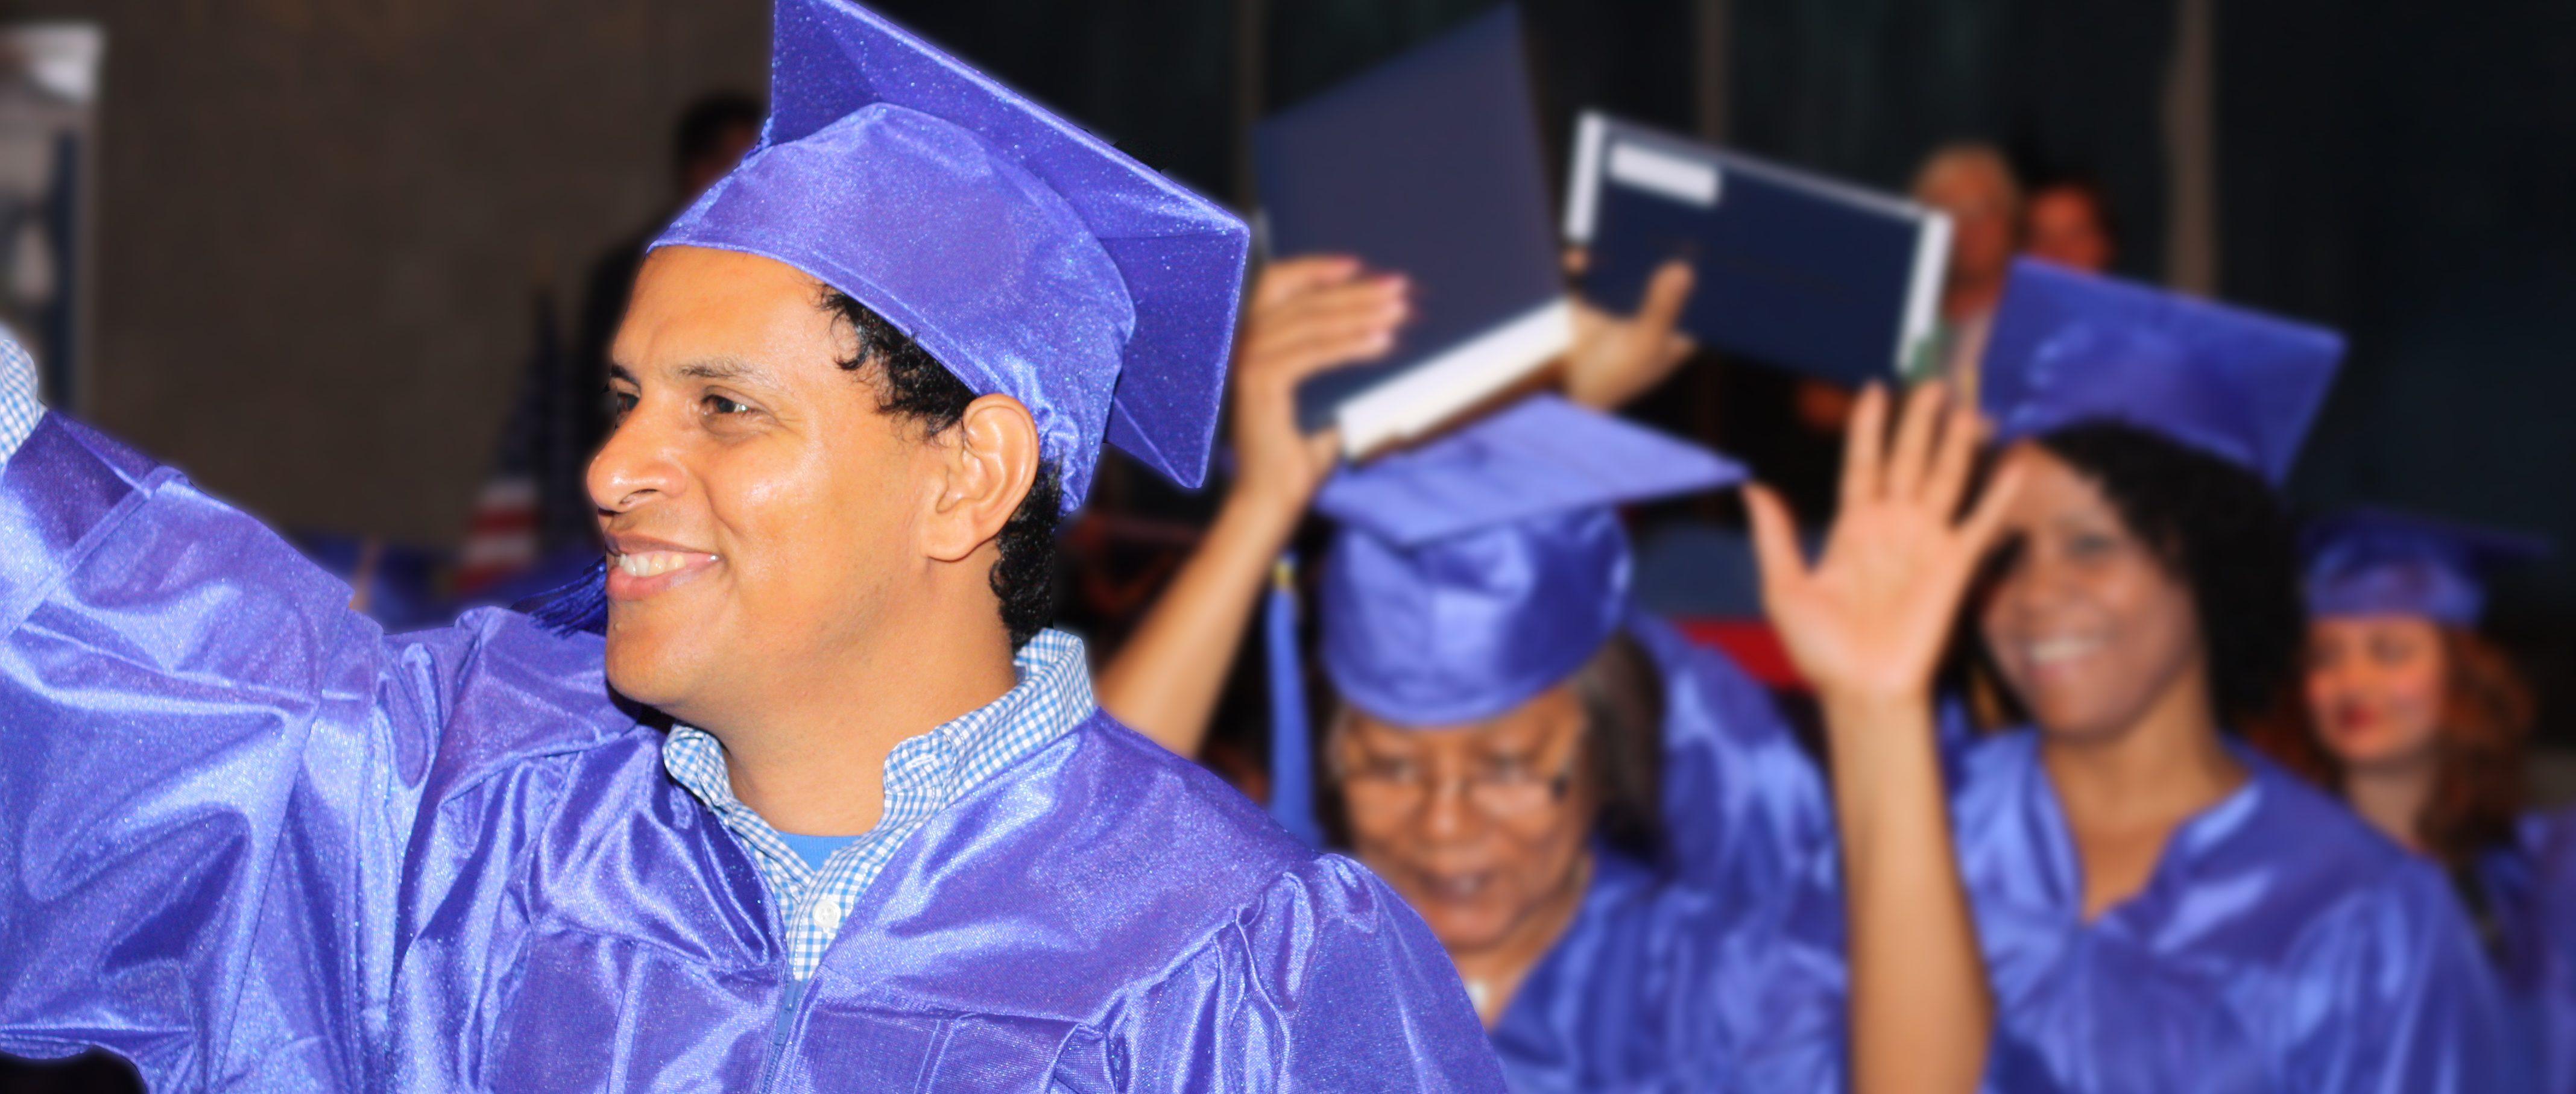 Graduates of the JVS Adult Diploma Pathway celebrating their graduation